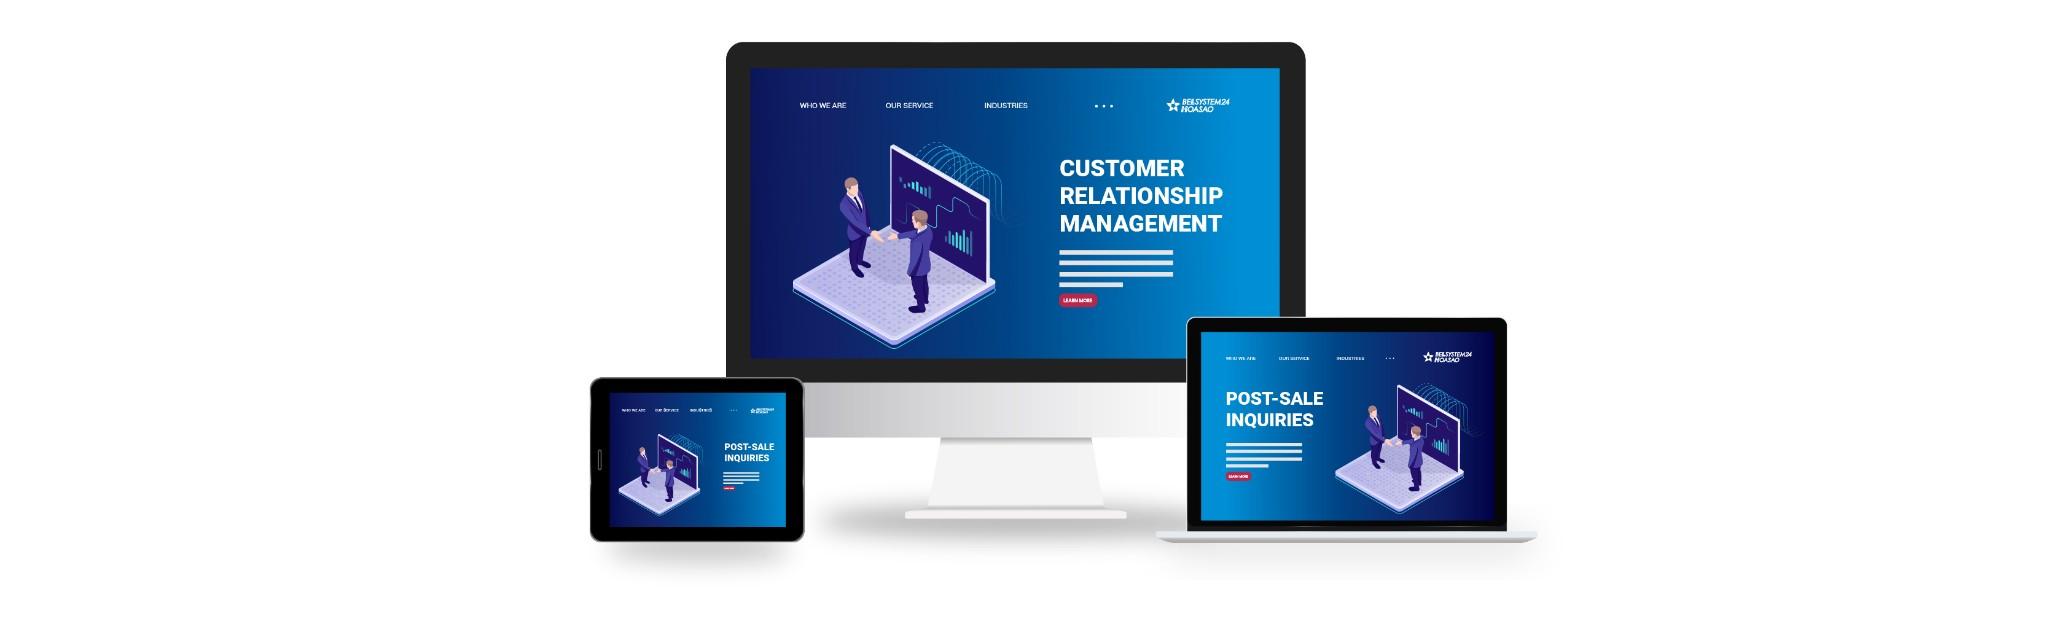 image Customer relationship management